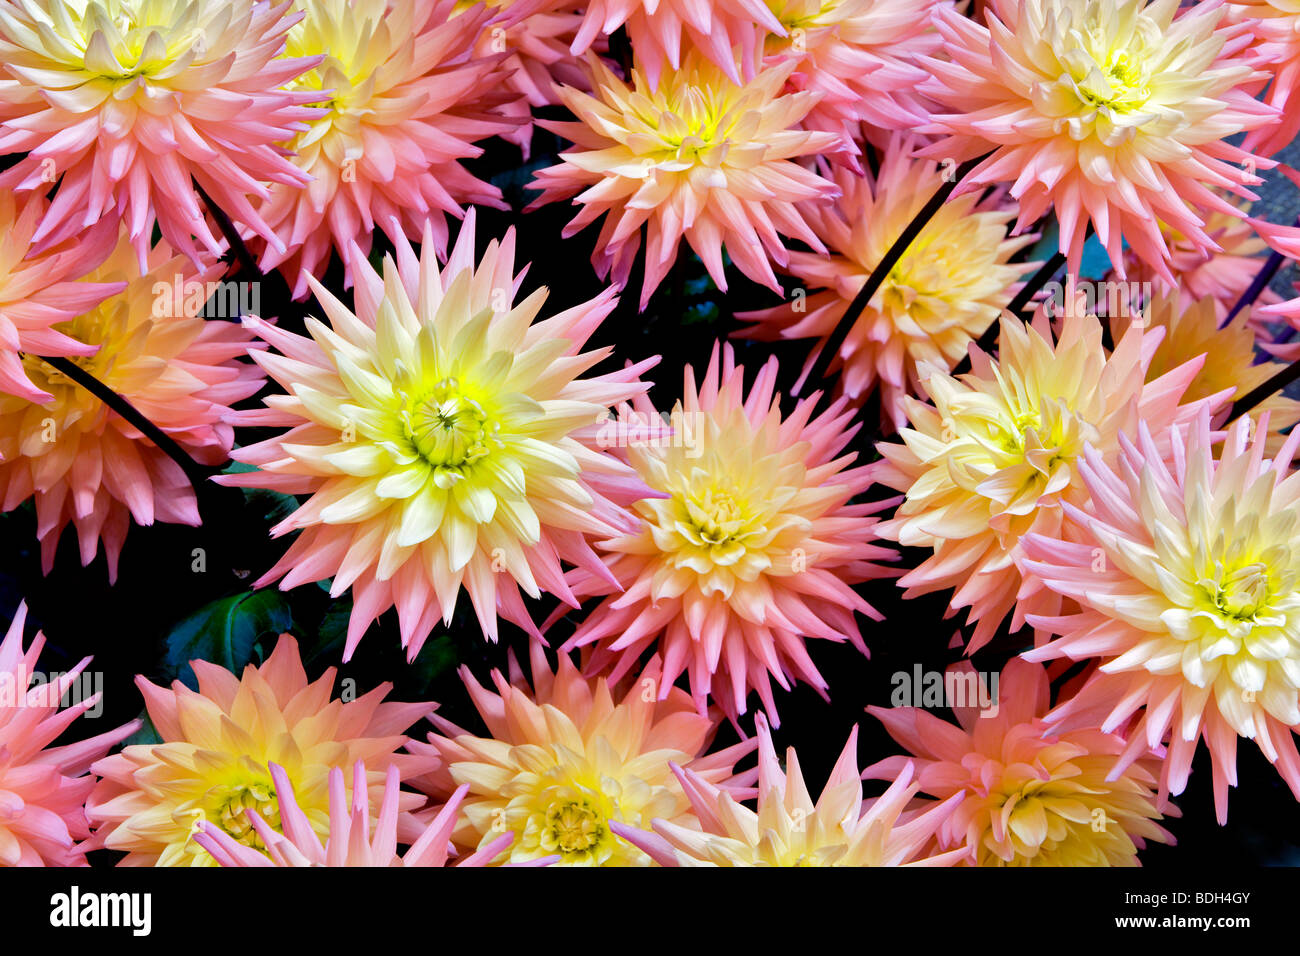 Dahlias variety Tropic Sun. Swan Island Dahlia Farm. Oregon - Stock Image